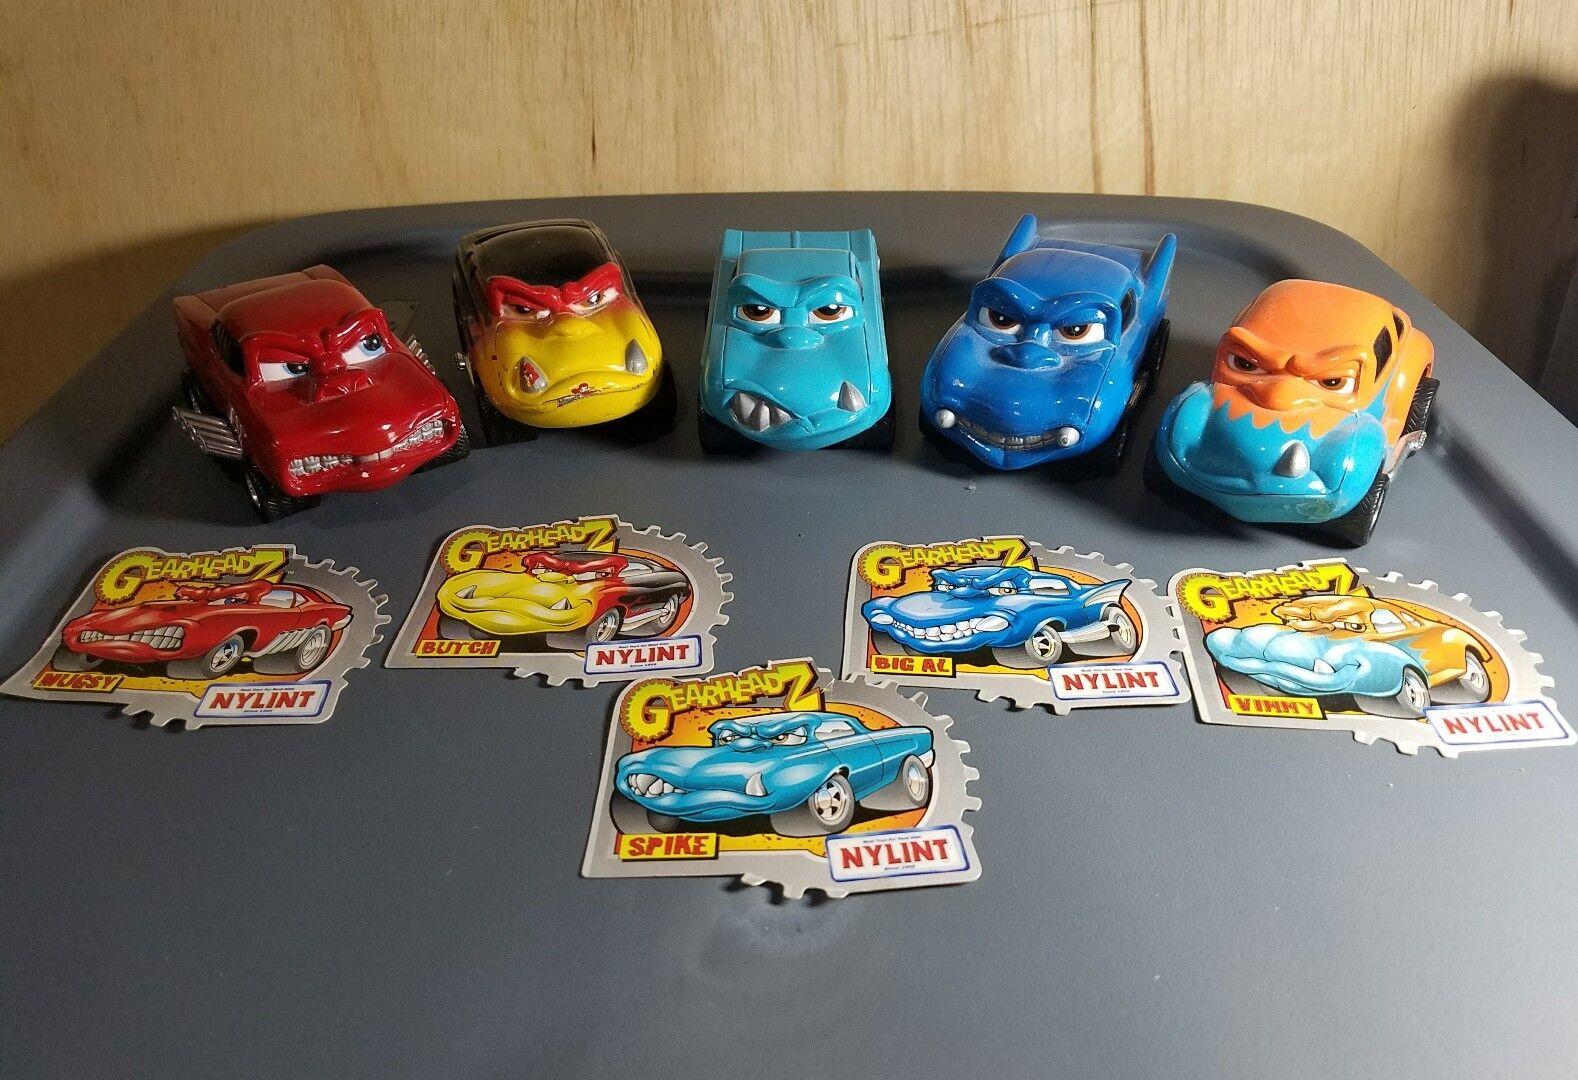 Nylint GearheadZ 5 Diecast Cars NICE RARE LOT